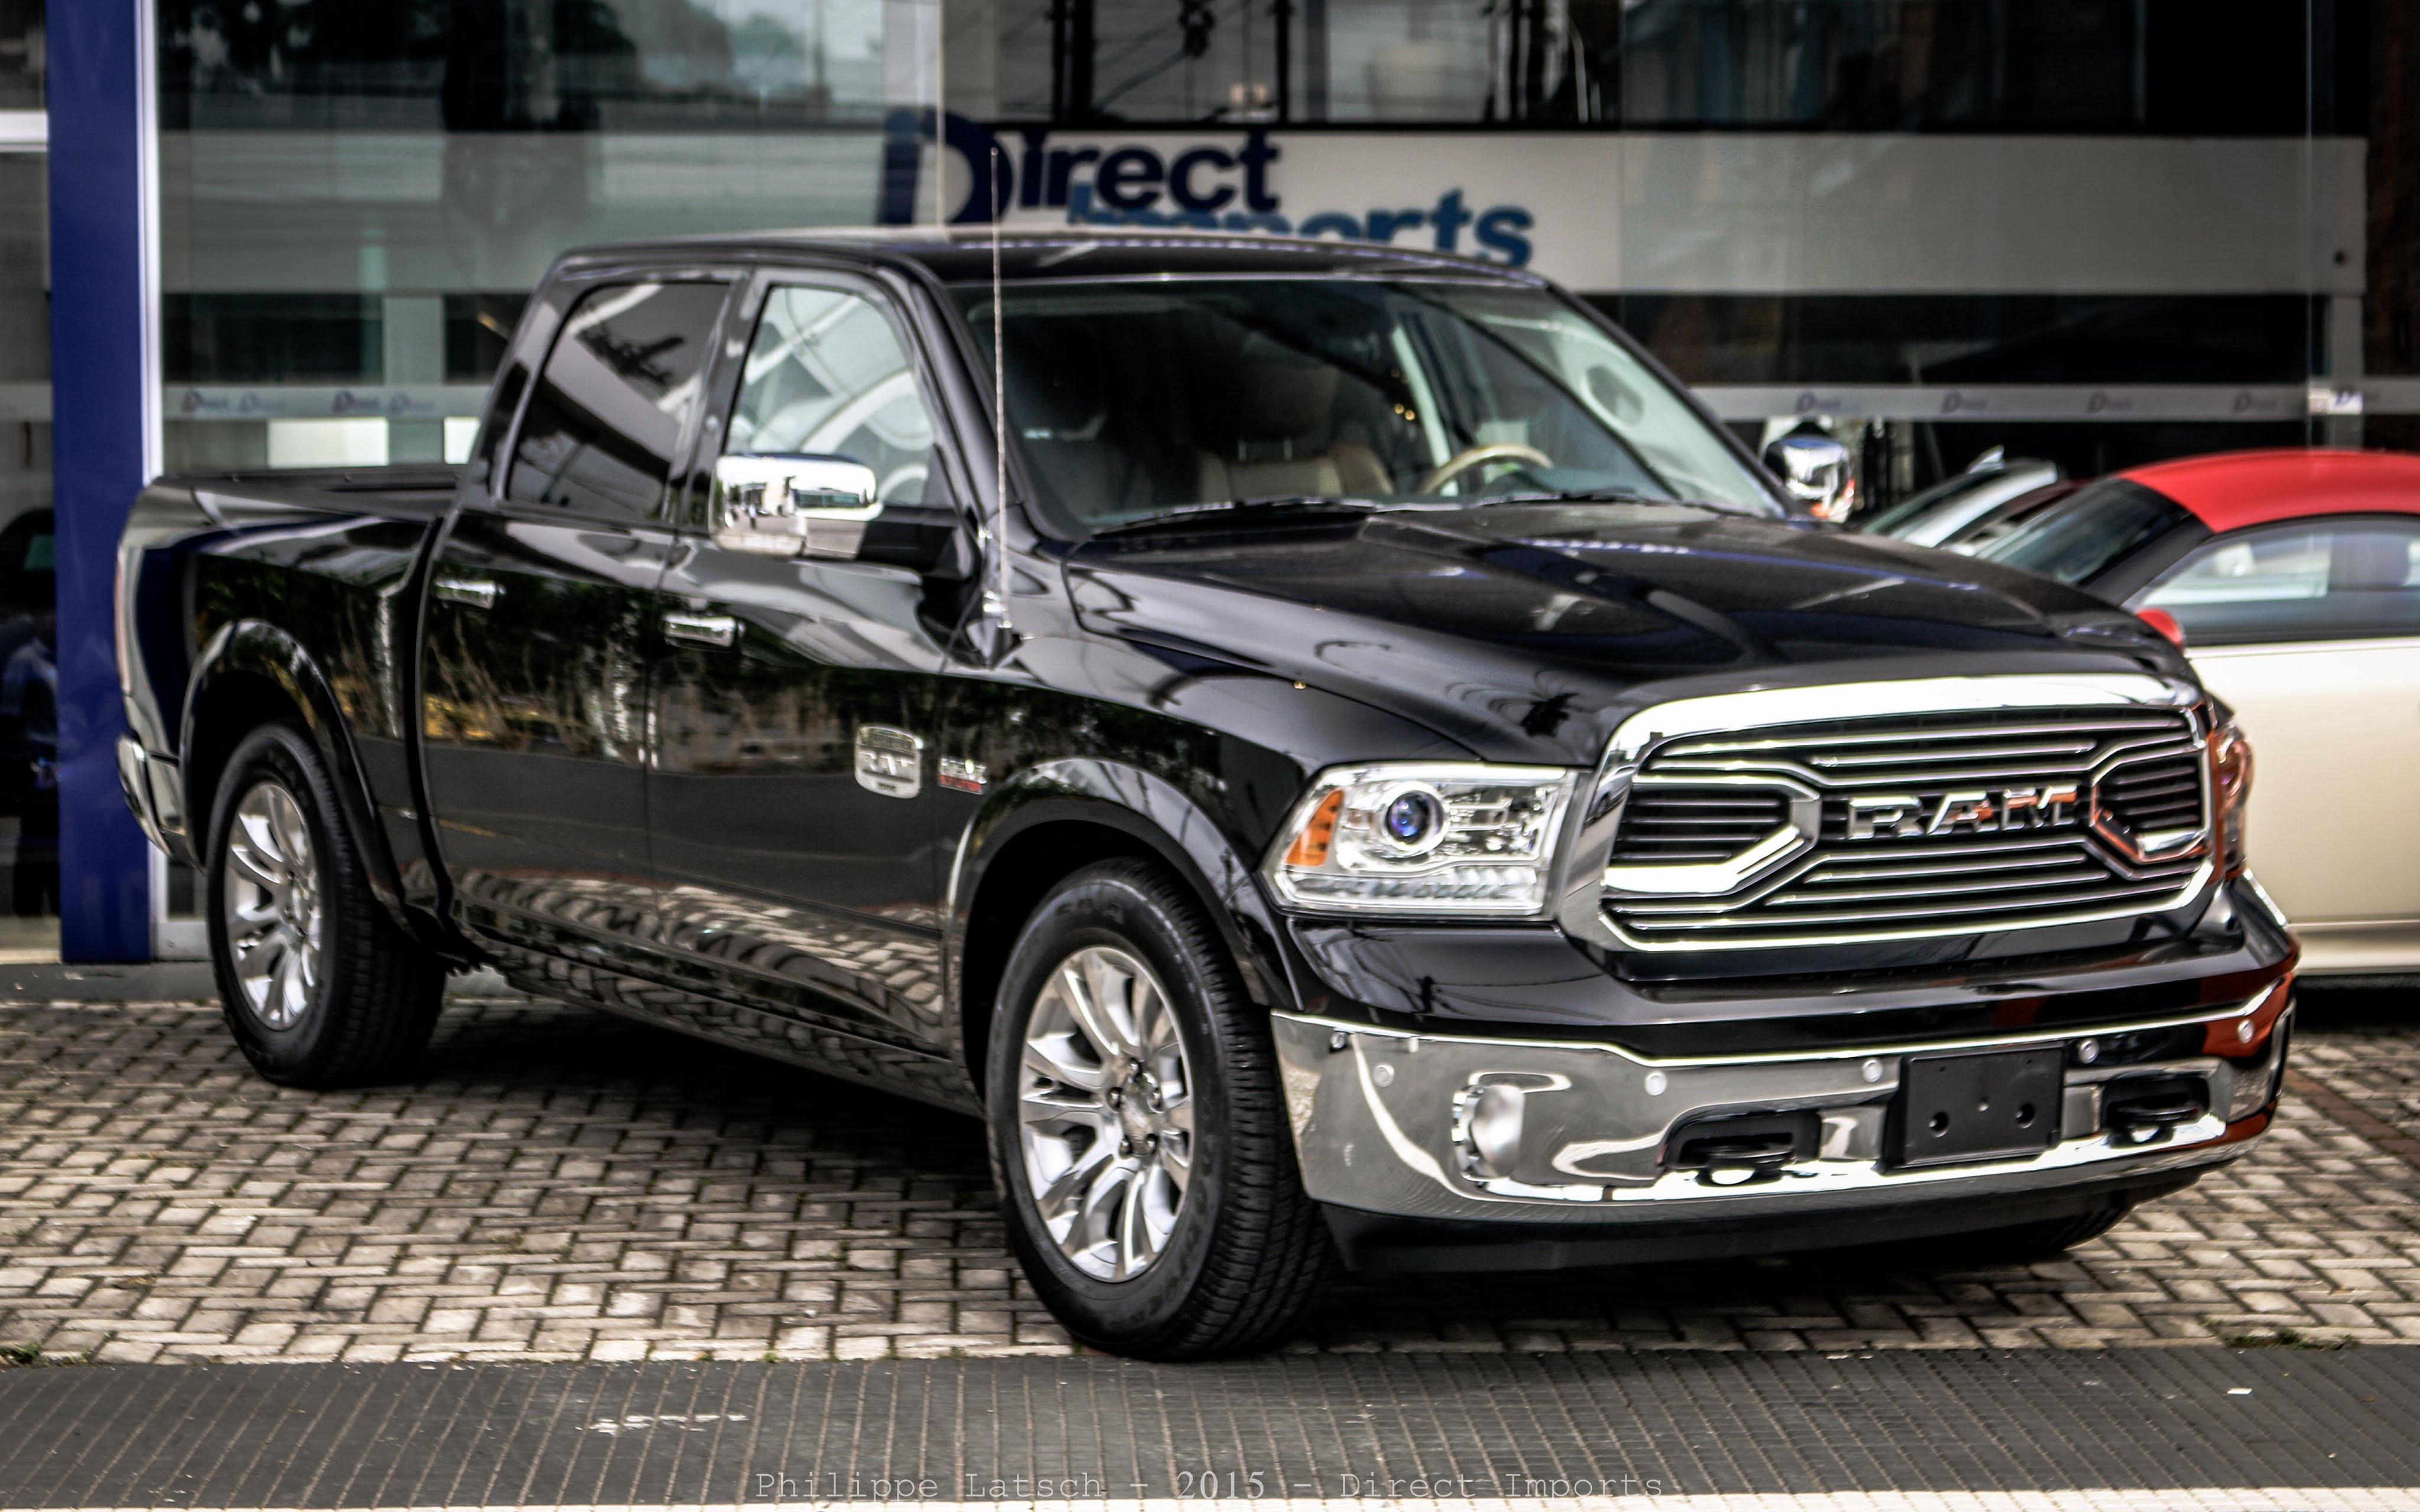 Dodge Ram 1500 Wallpapers Vehicles Hq Dodge Ram 1500 Pictures 4k Wallpapers 2019